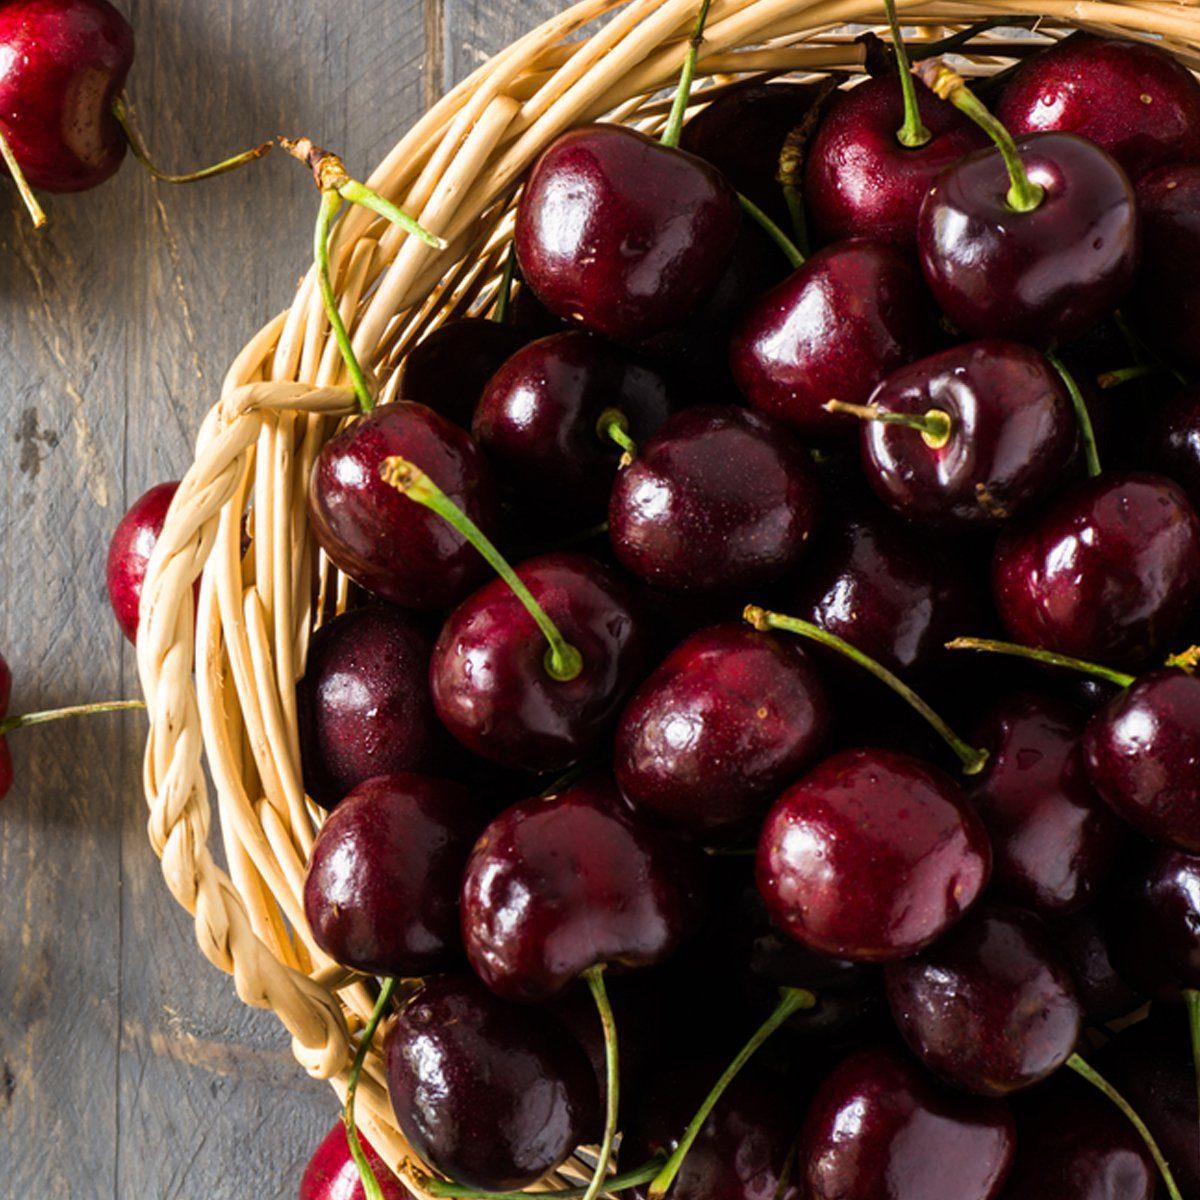 bunch of cherries in a wicker basket